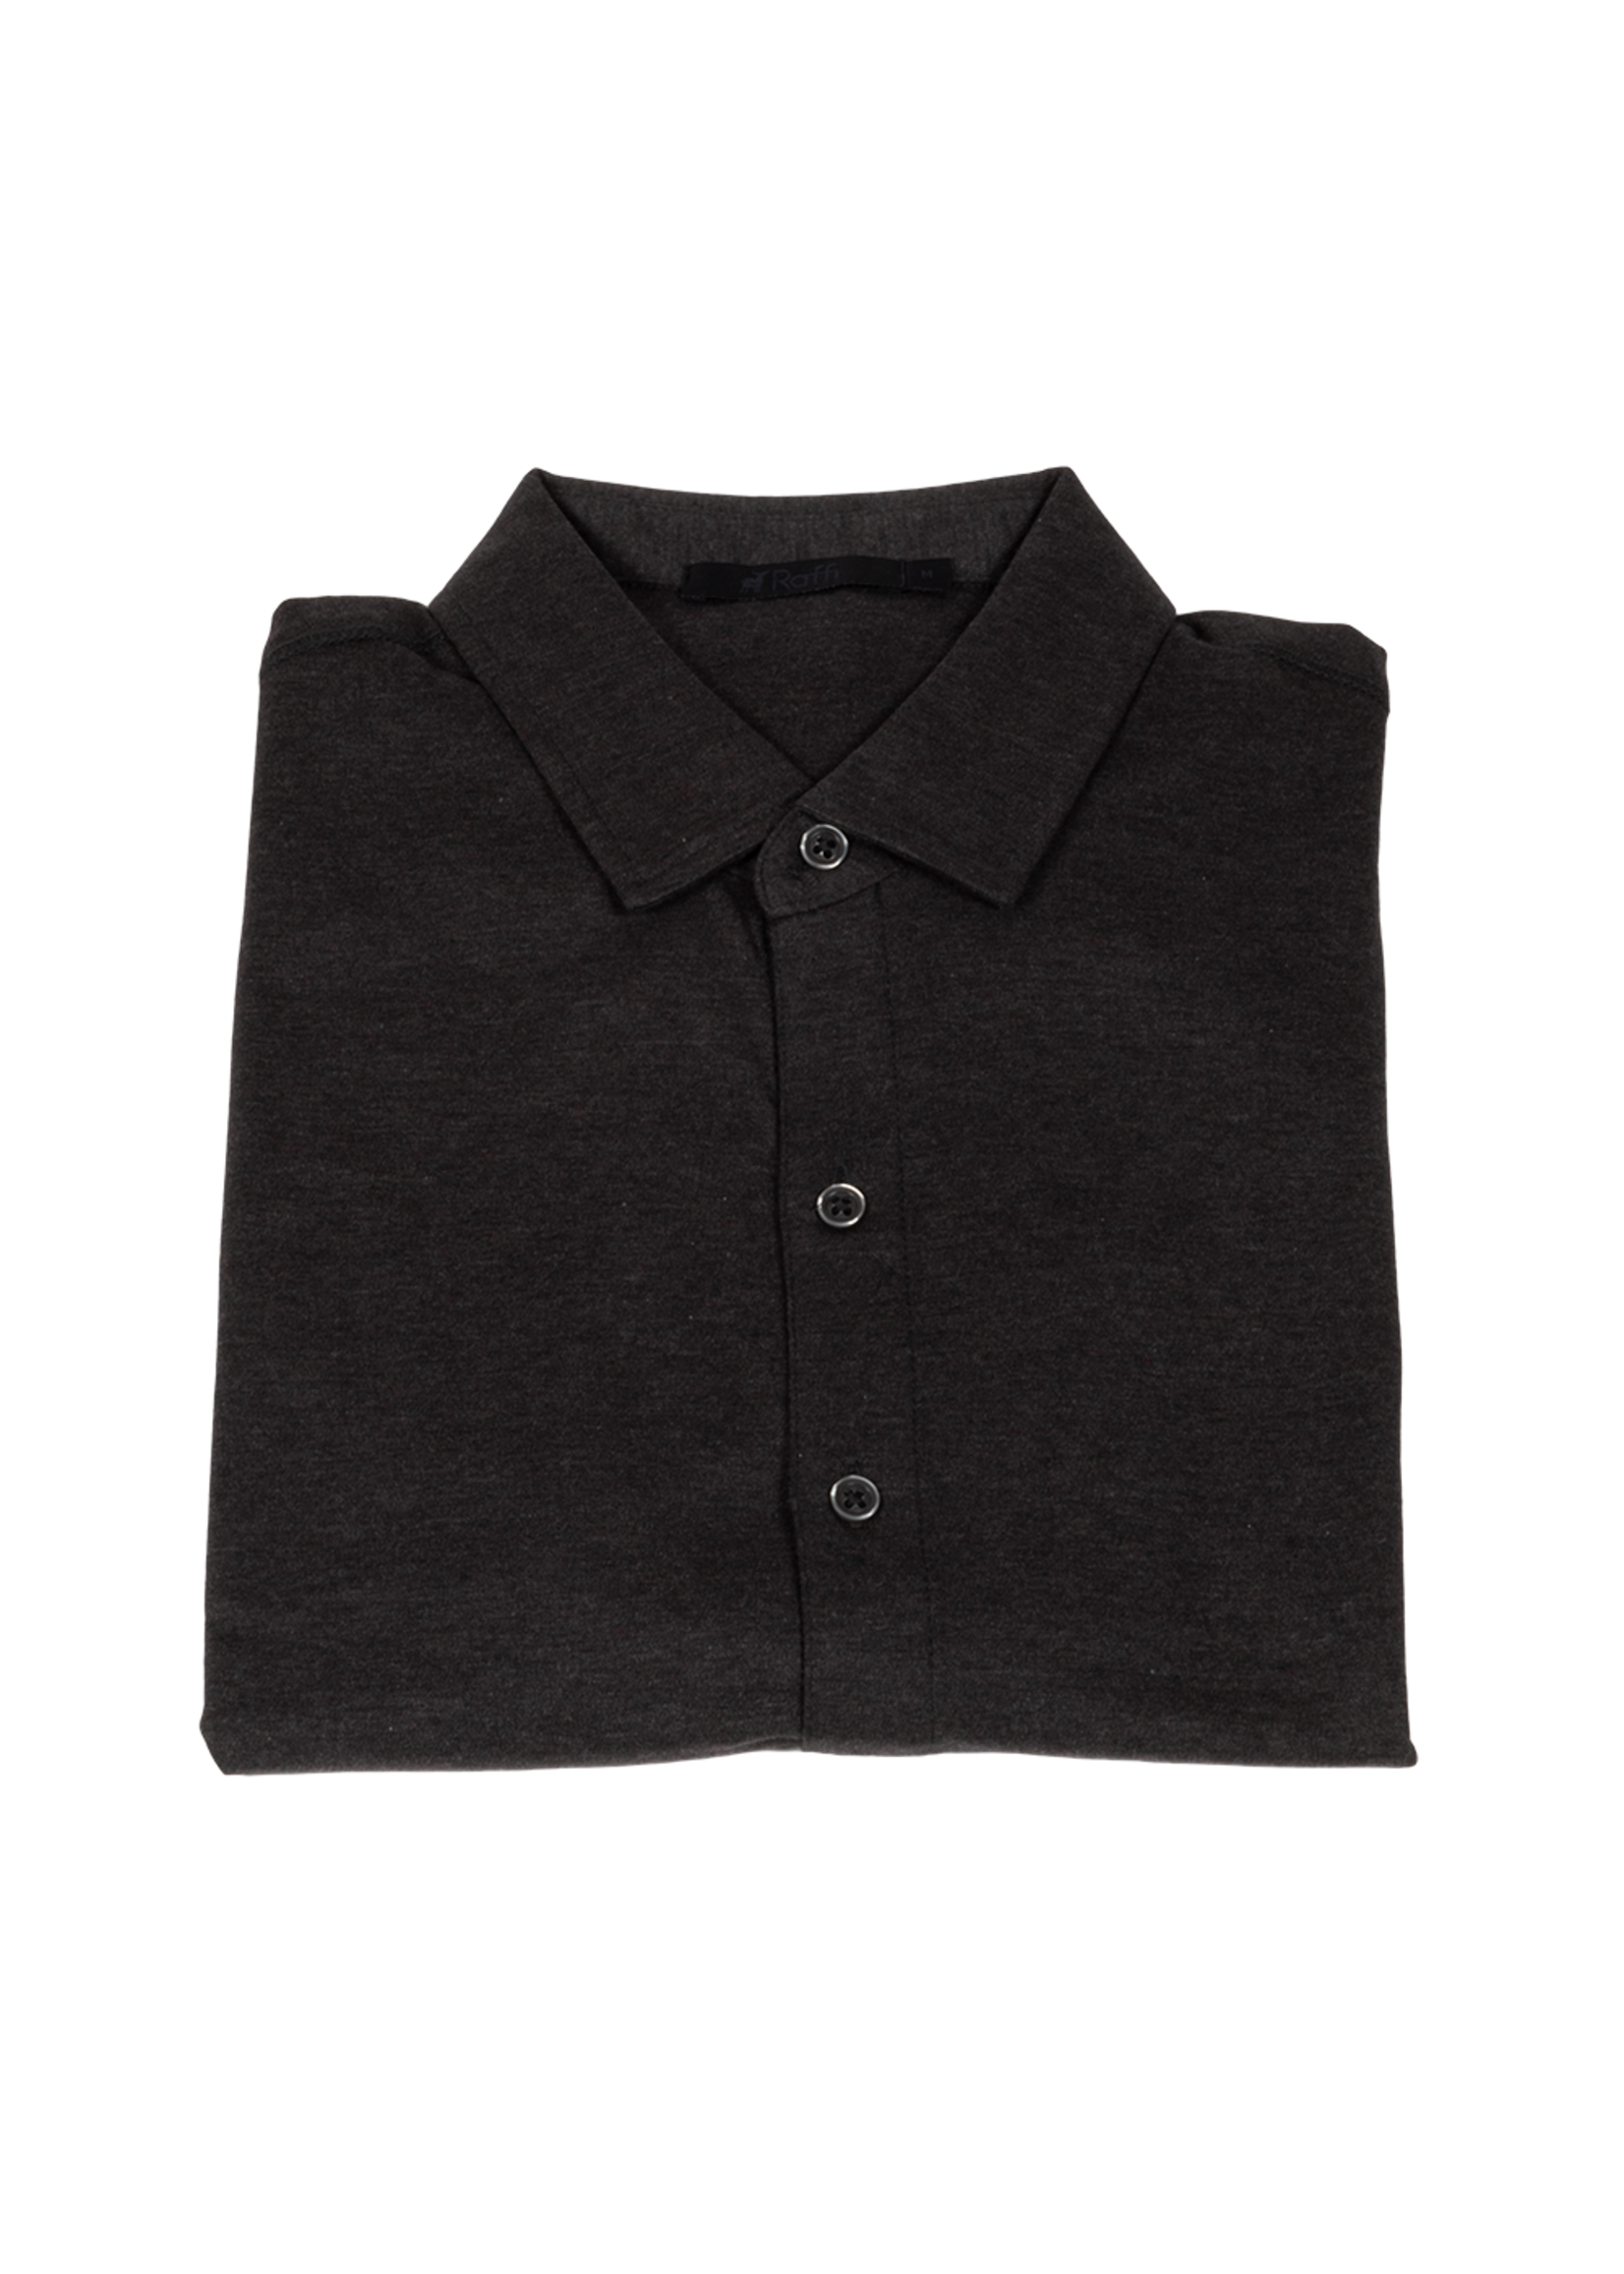 Raffi Raffi Aqua Cotton Short Sleeve Shirt Espresso